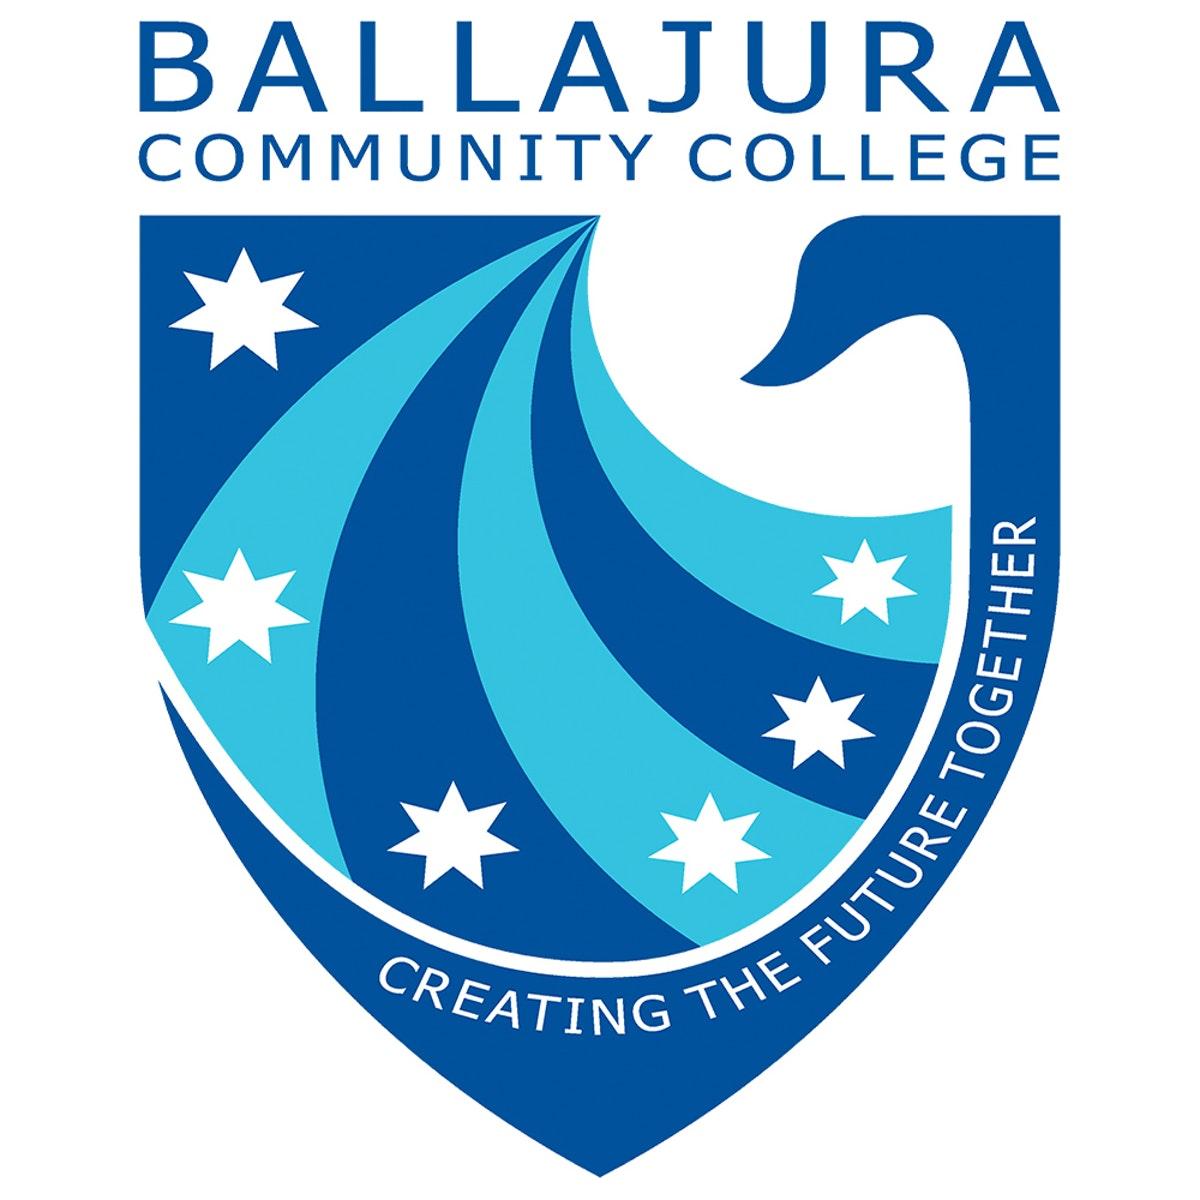 Trường Trung Học Ballajura Community College - Western Australia, Úc